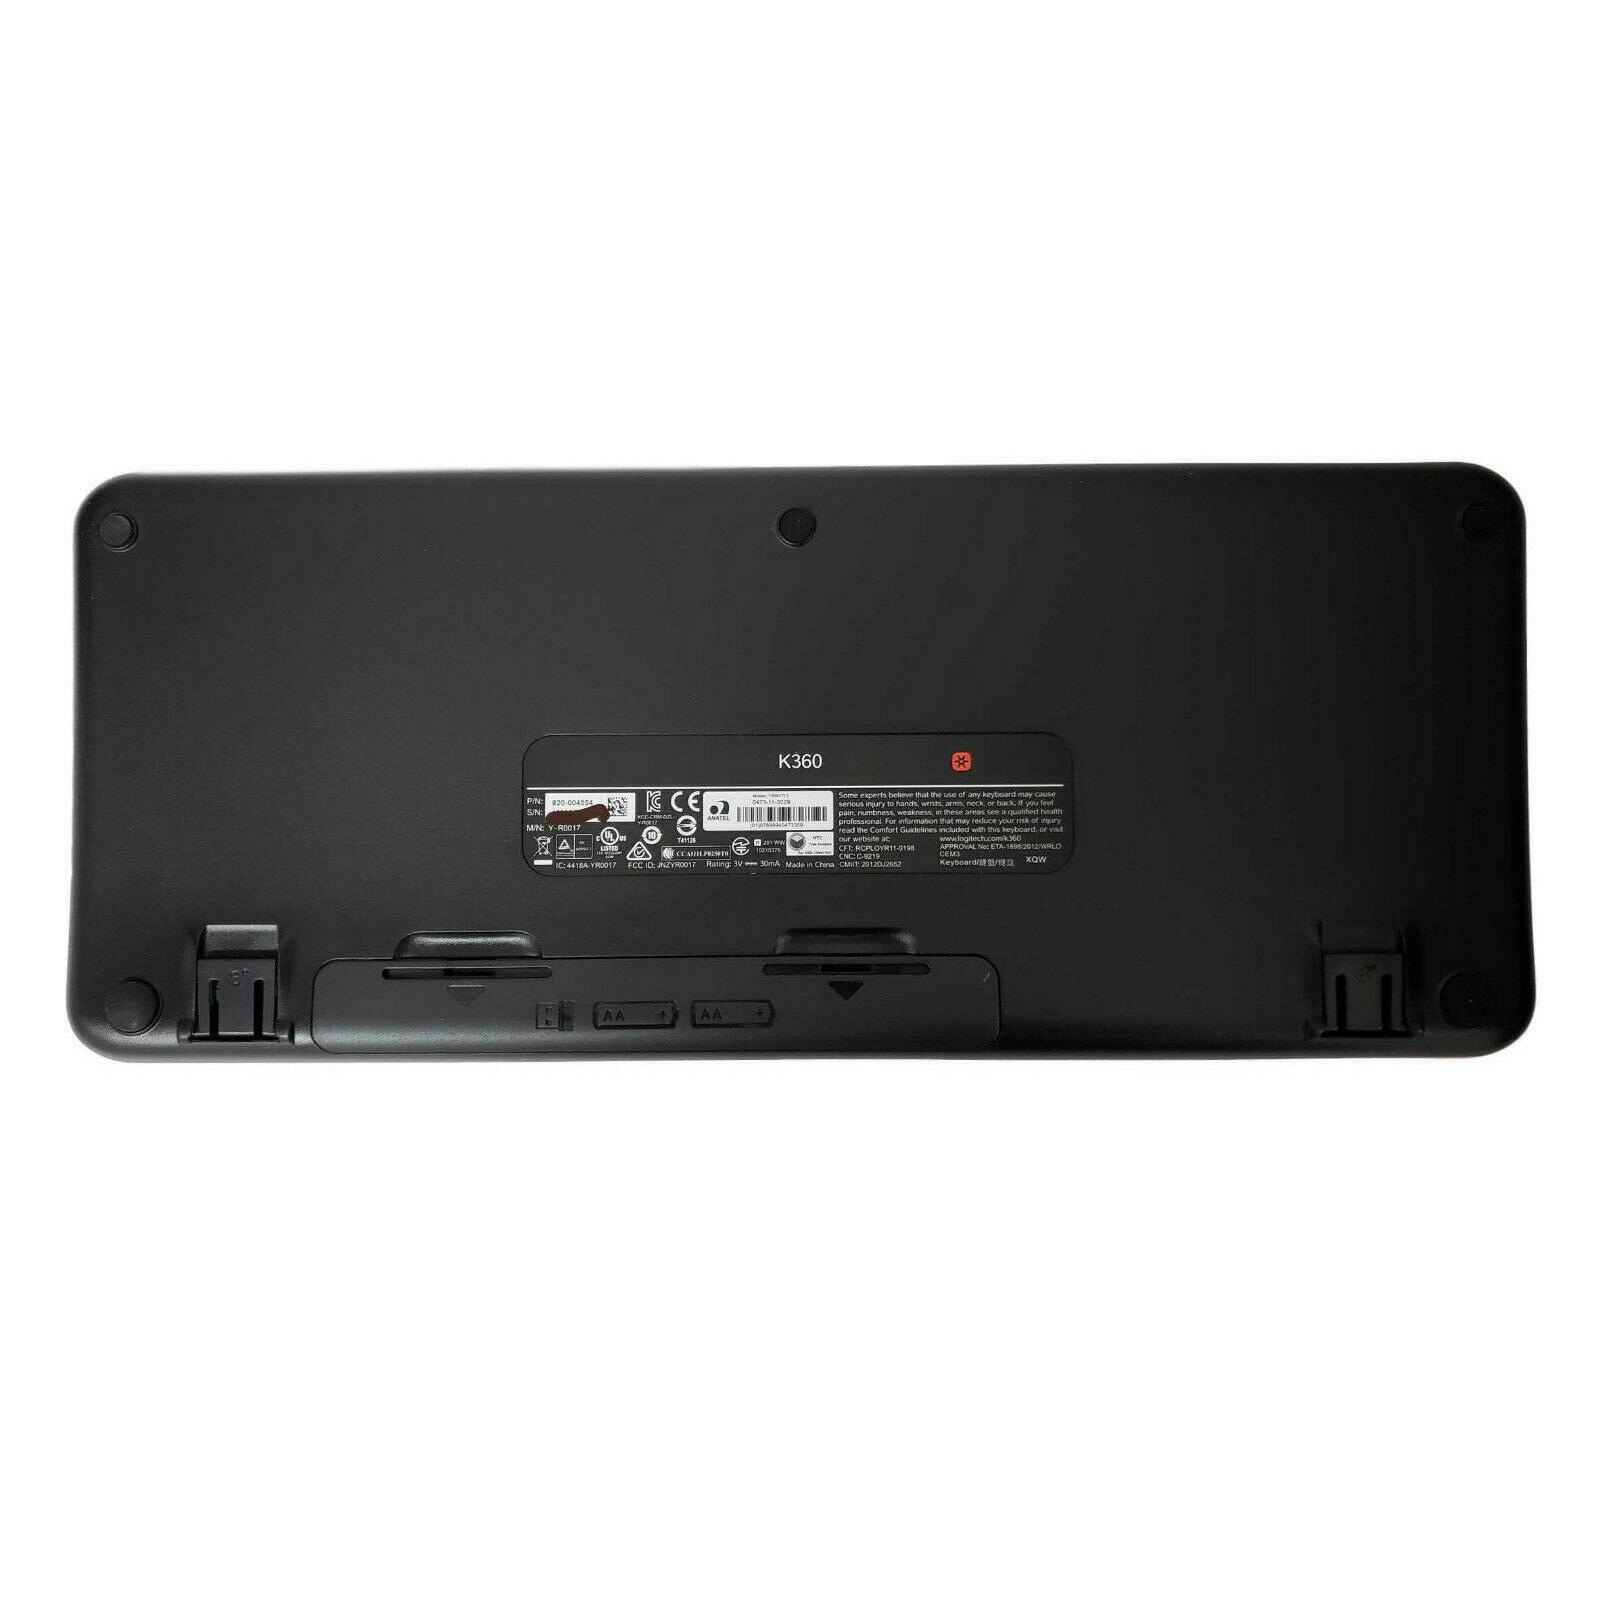 Logitech Keyboard QWERTY Wireless K360